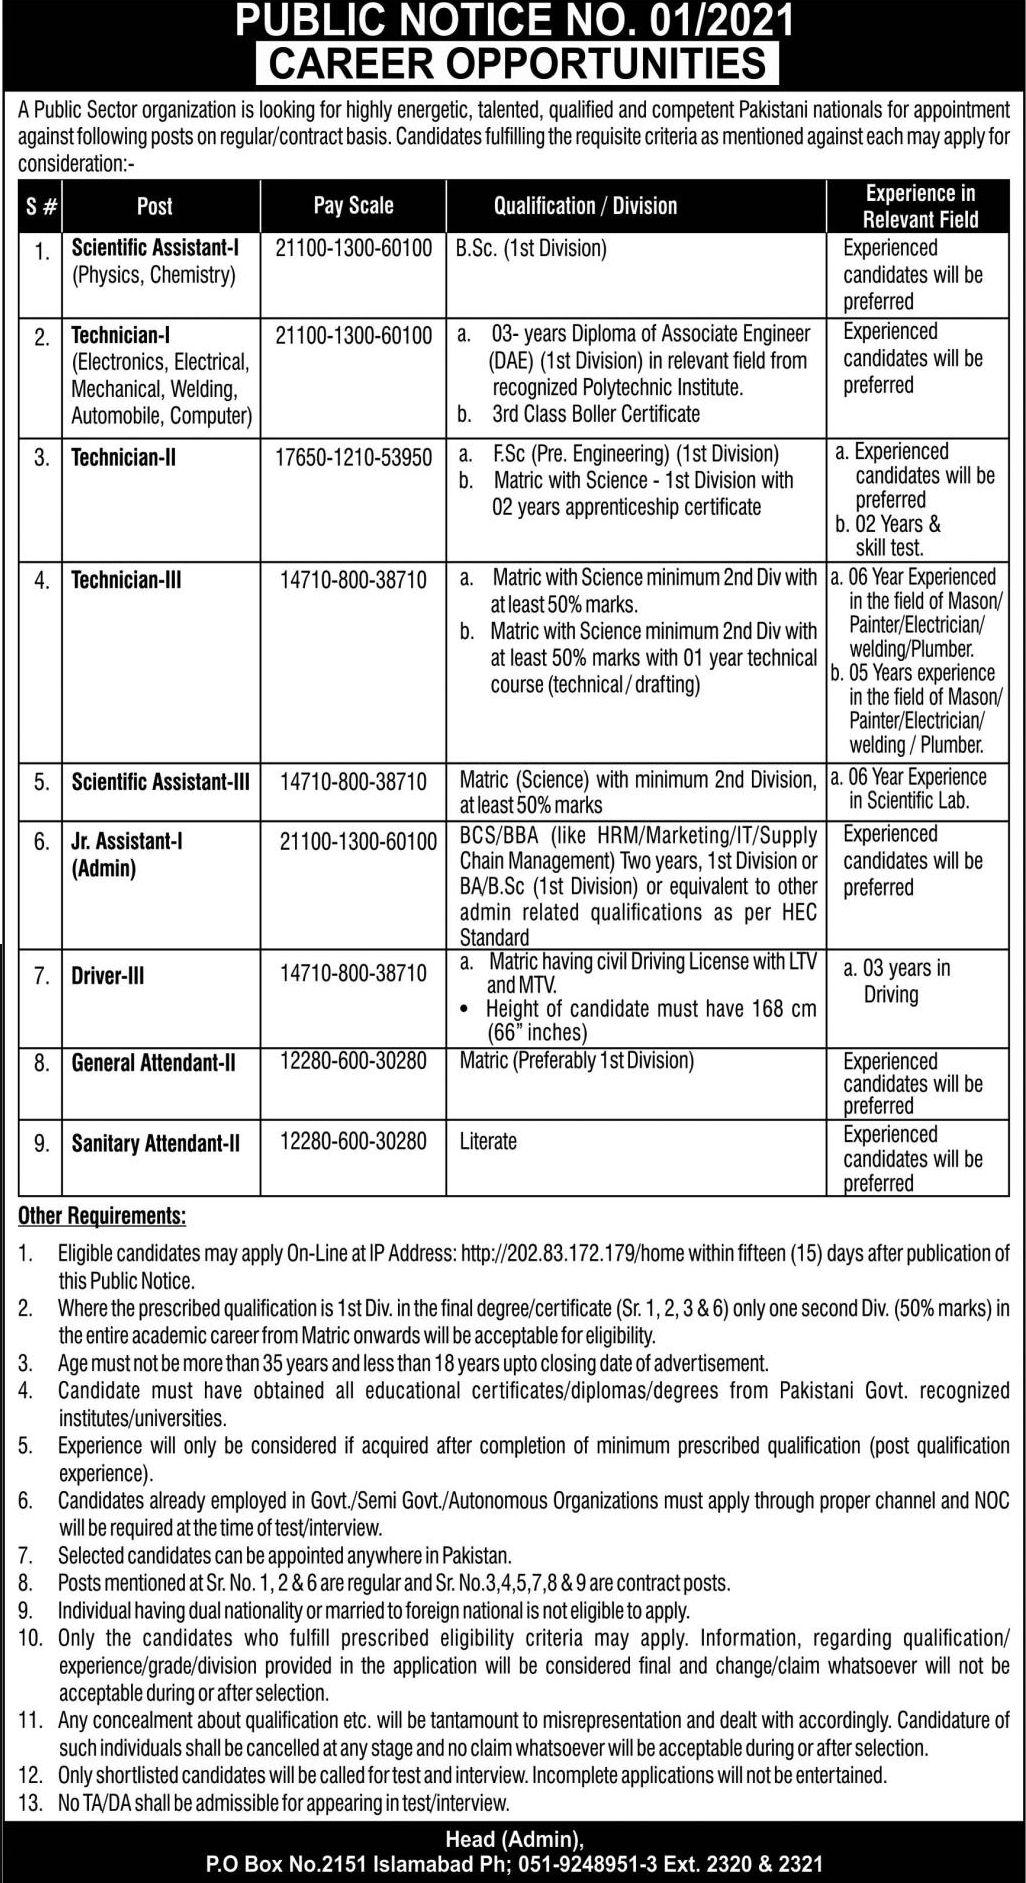 Public Sector Organization Vacancies 2021 – Dailyjobs.pk 3